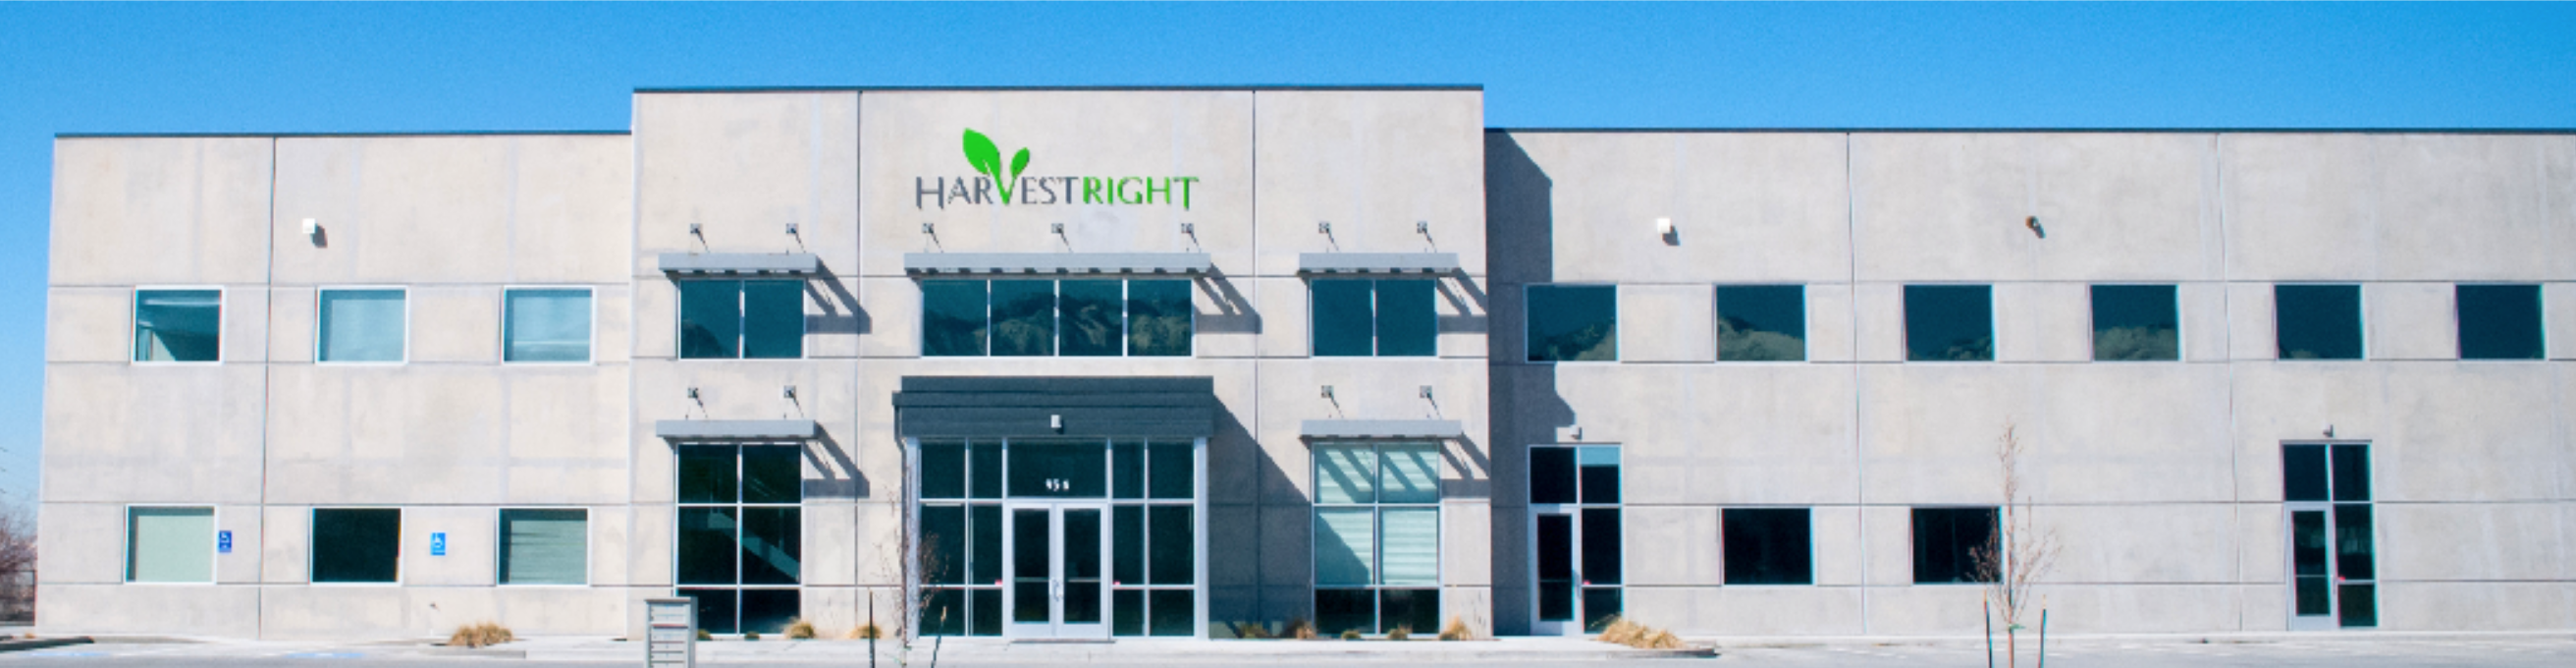 Harvest Right headquarters